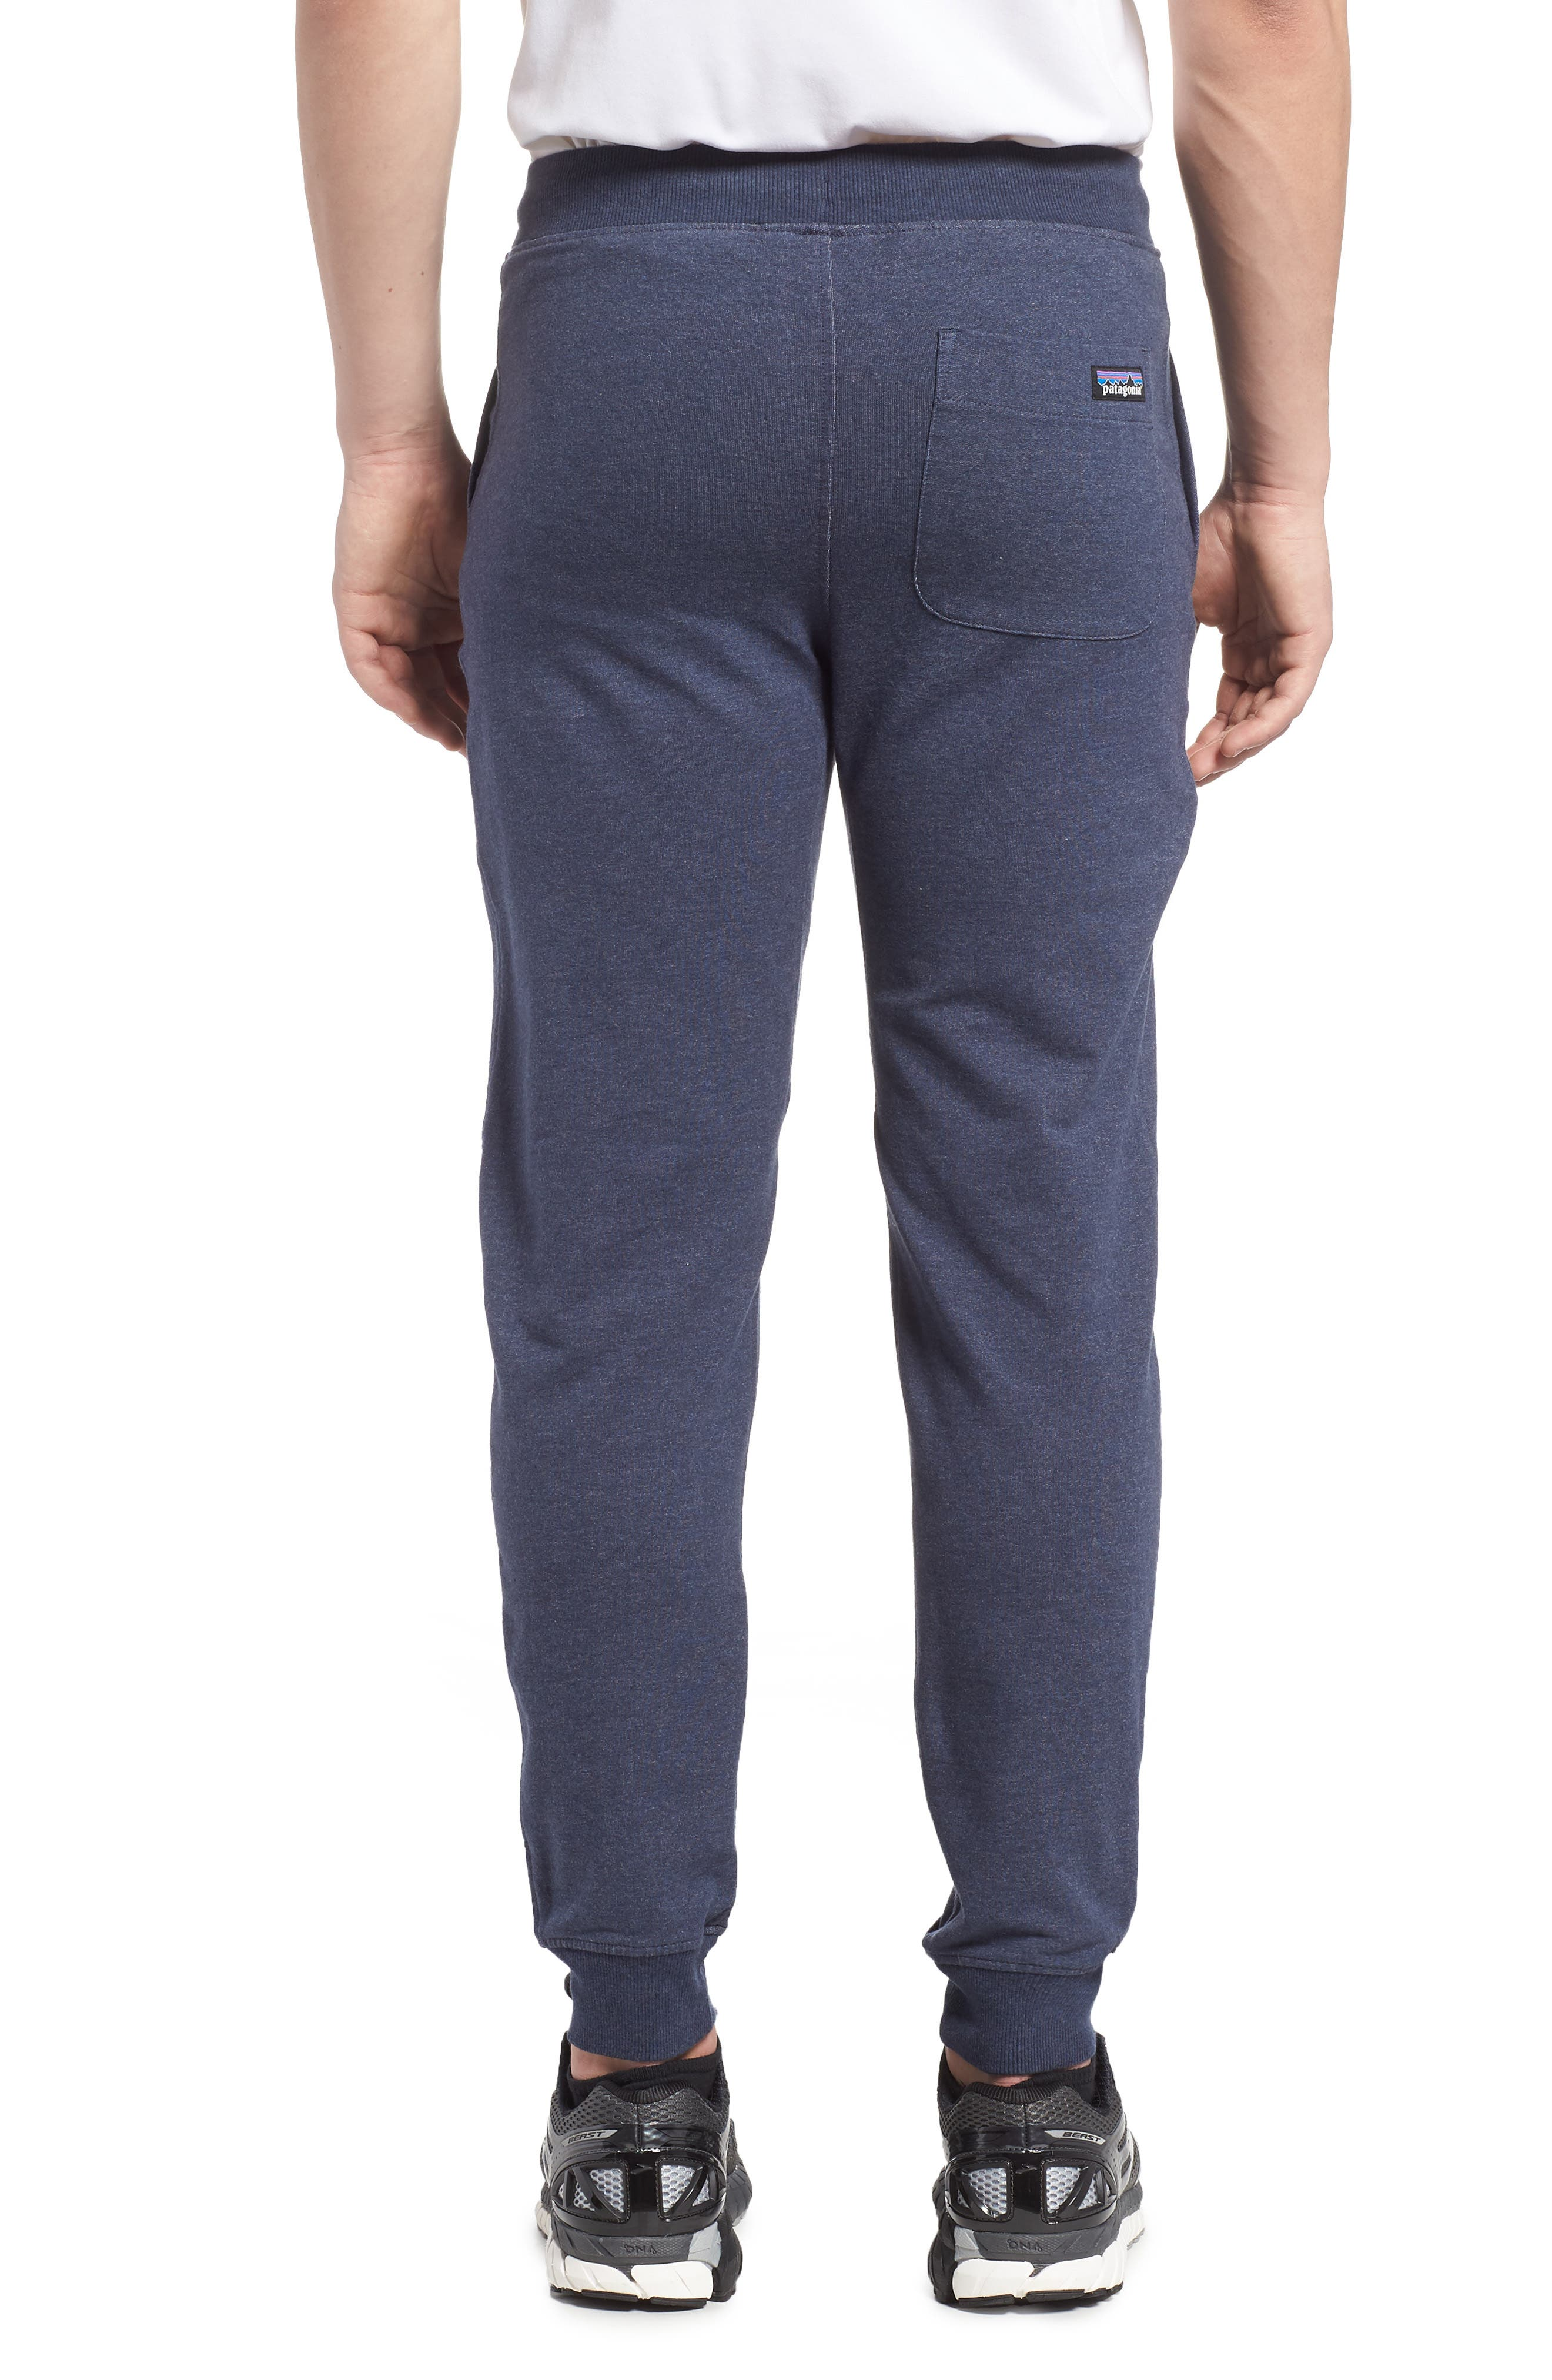 M's Mahnya Fleece Jogger Pants,                             Alternate thumbnail 2, color,                             Navy Blue